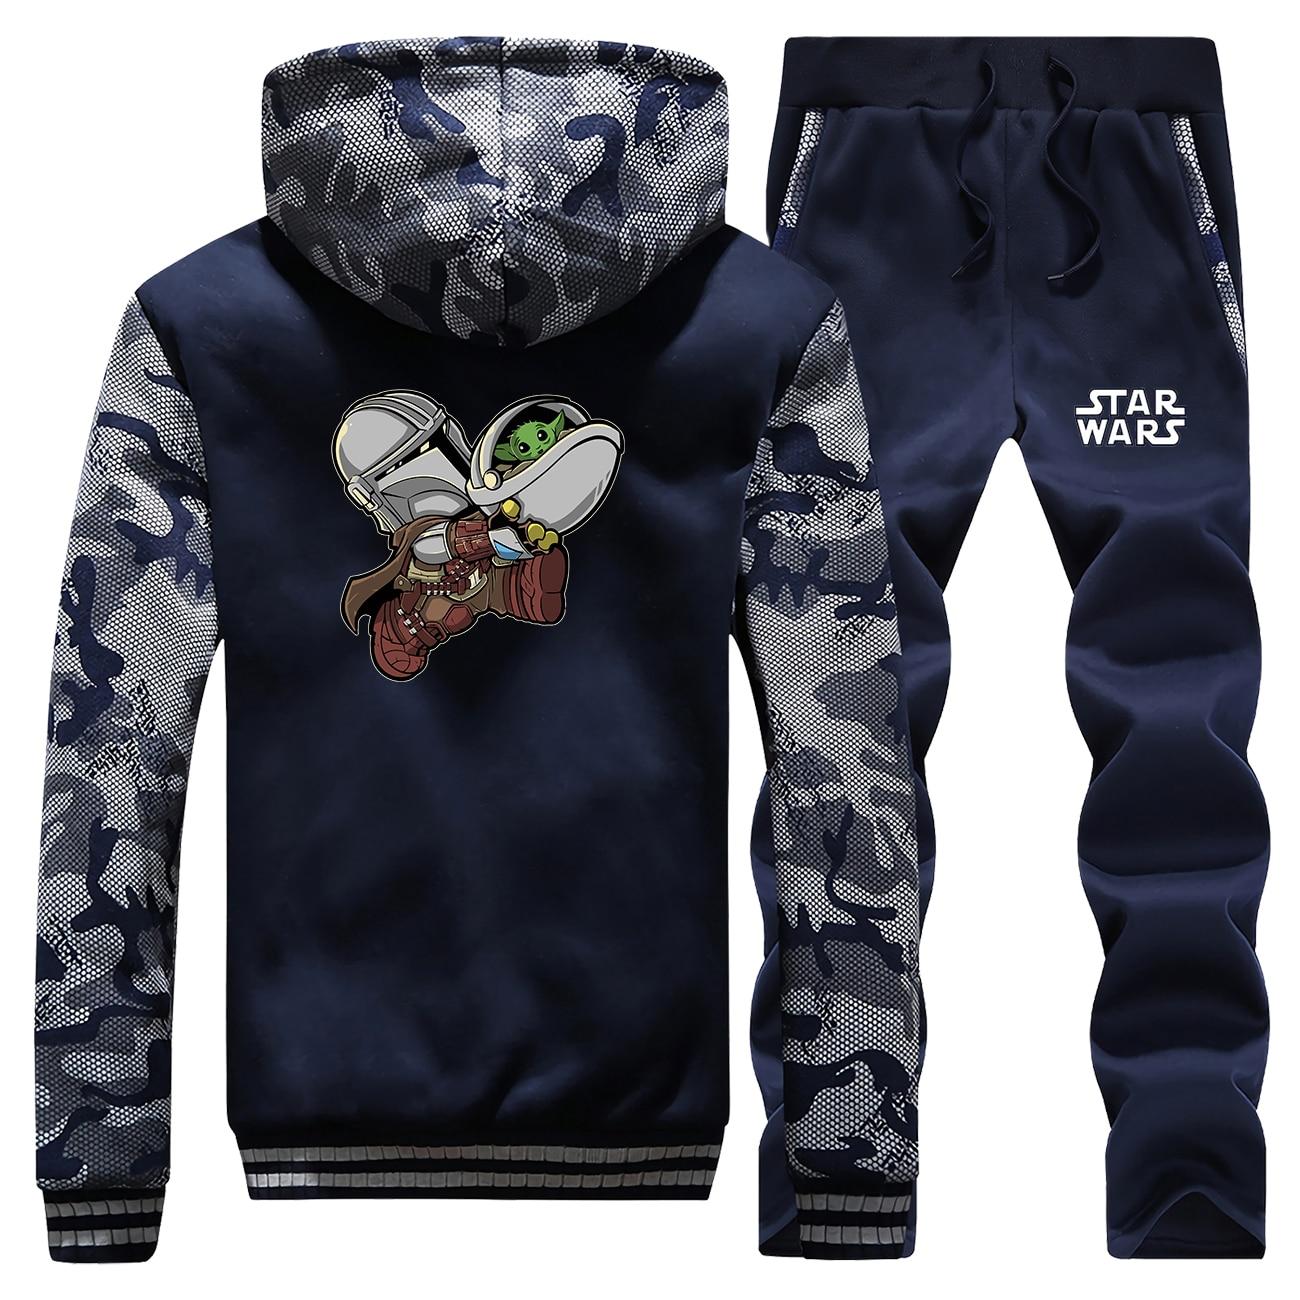 Baby Yoda Mandalorian Winter Men Camo Pans Sets Thick Warm Fleece Jacket Print Cartoon Hoodies Raglan Jackets Sweatshirts Coats